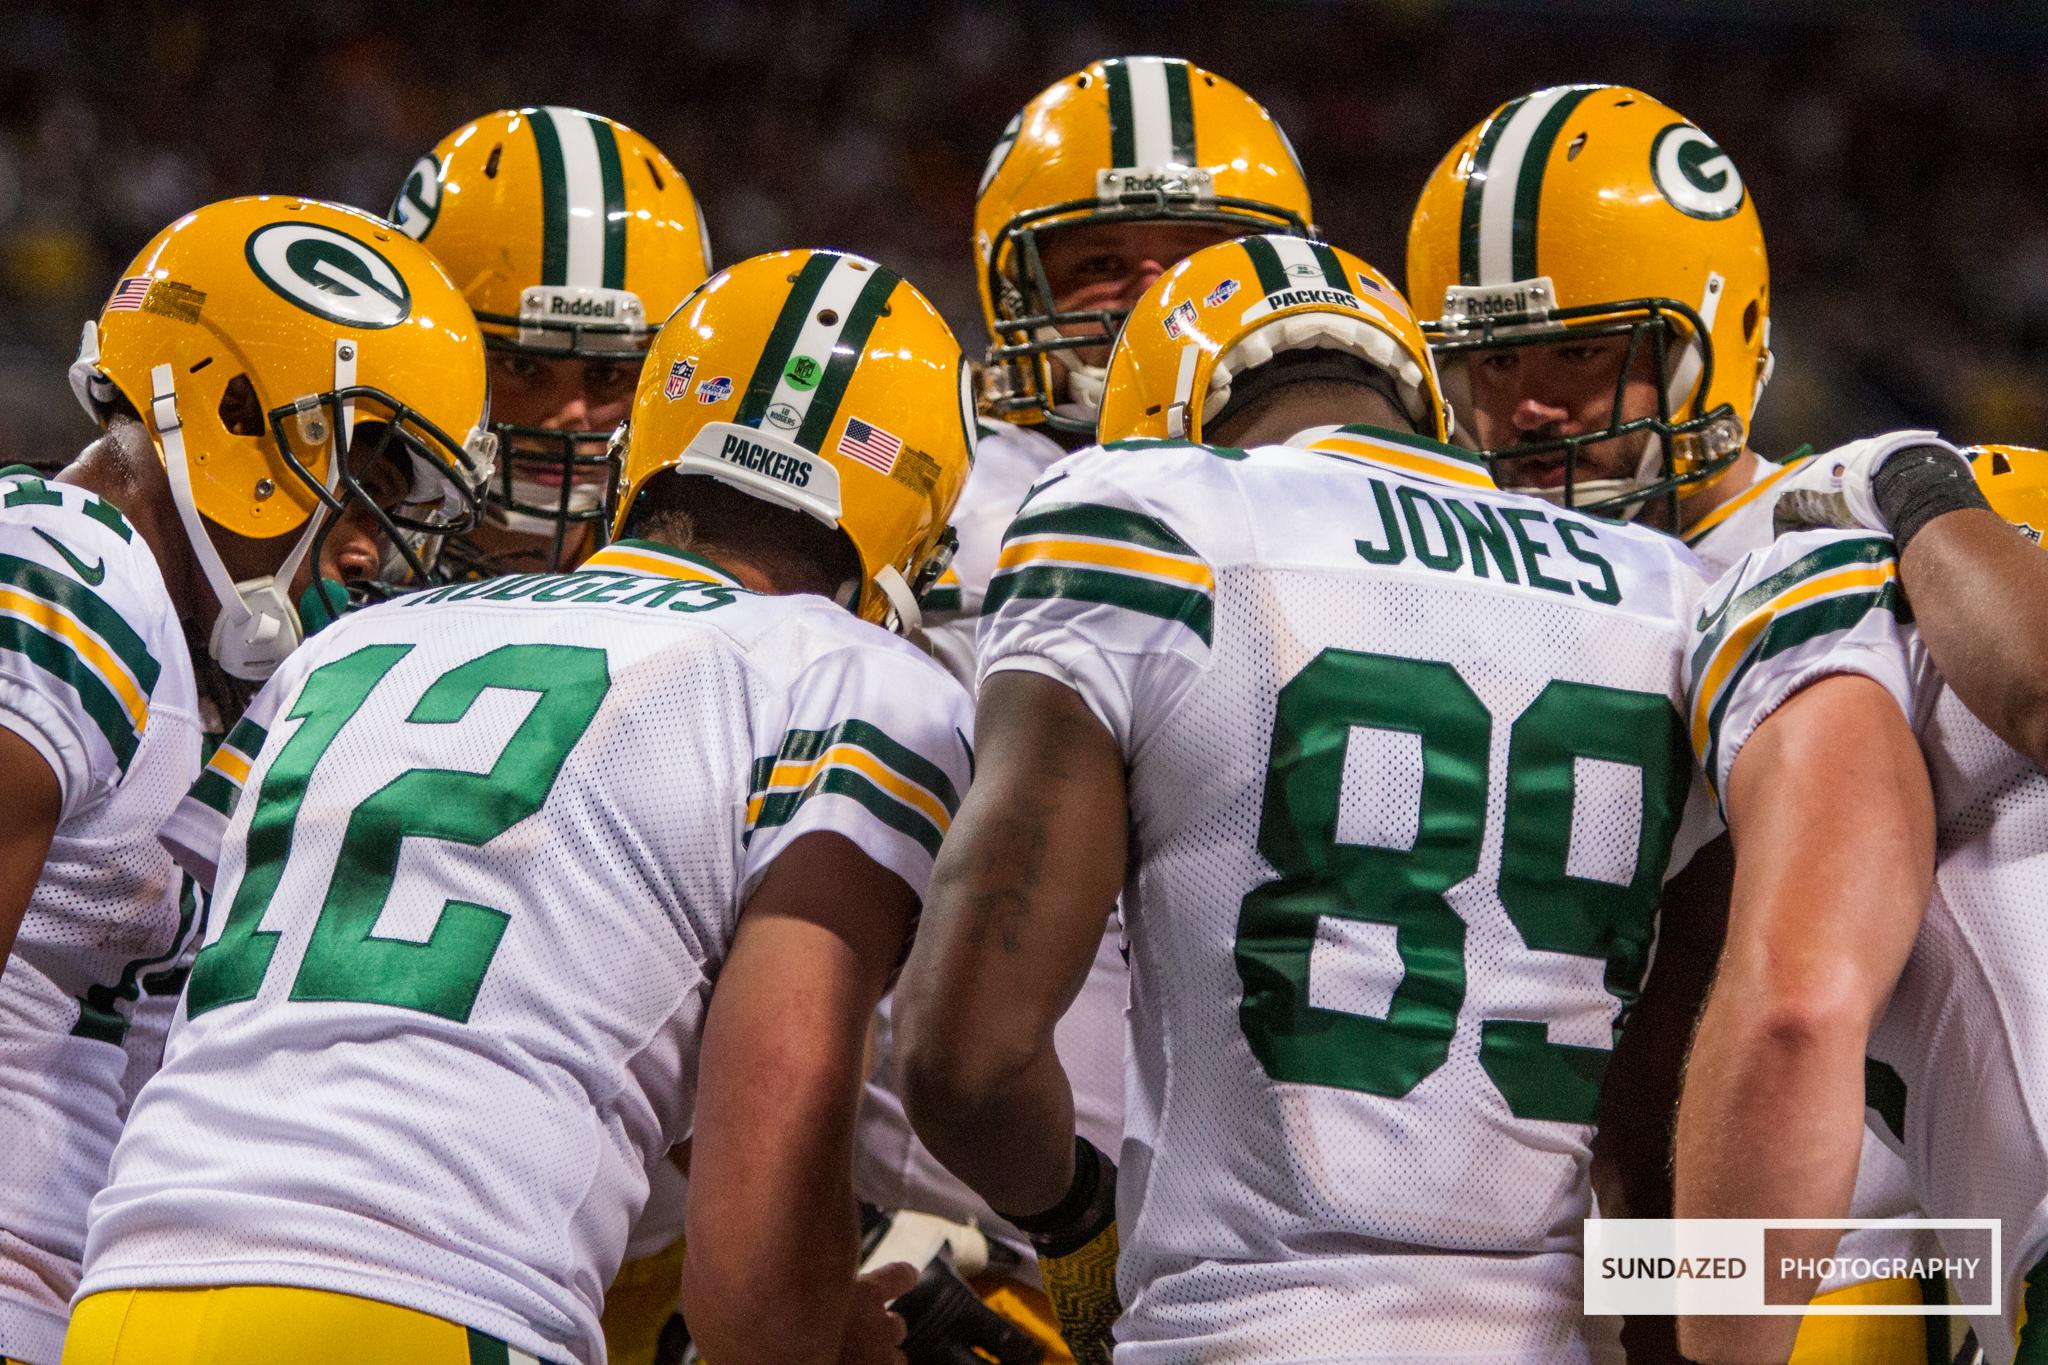 Sunday_NFL_STL_GB_0276.jpg